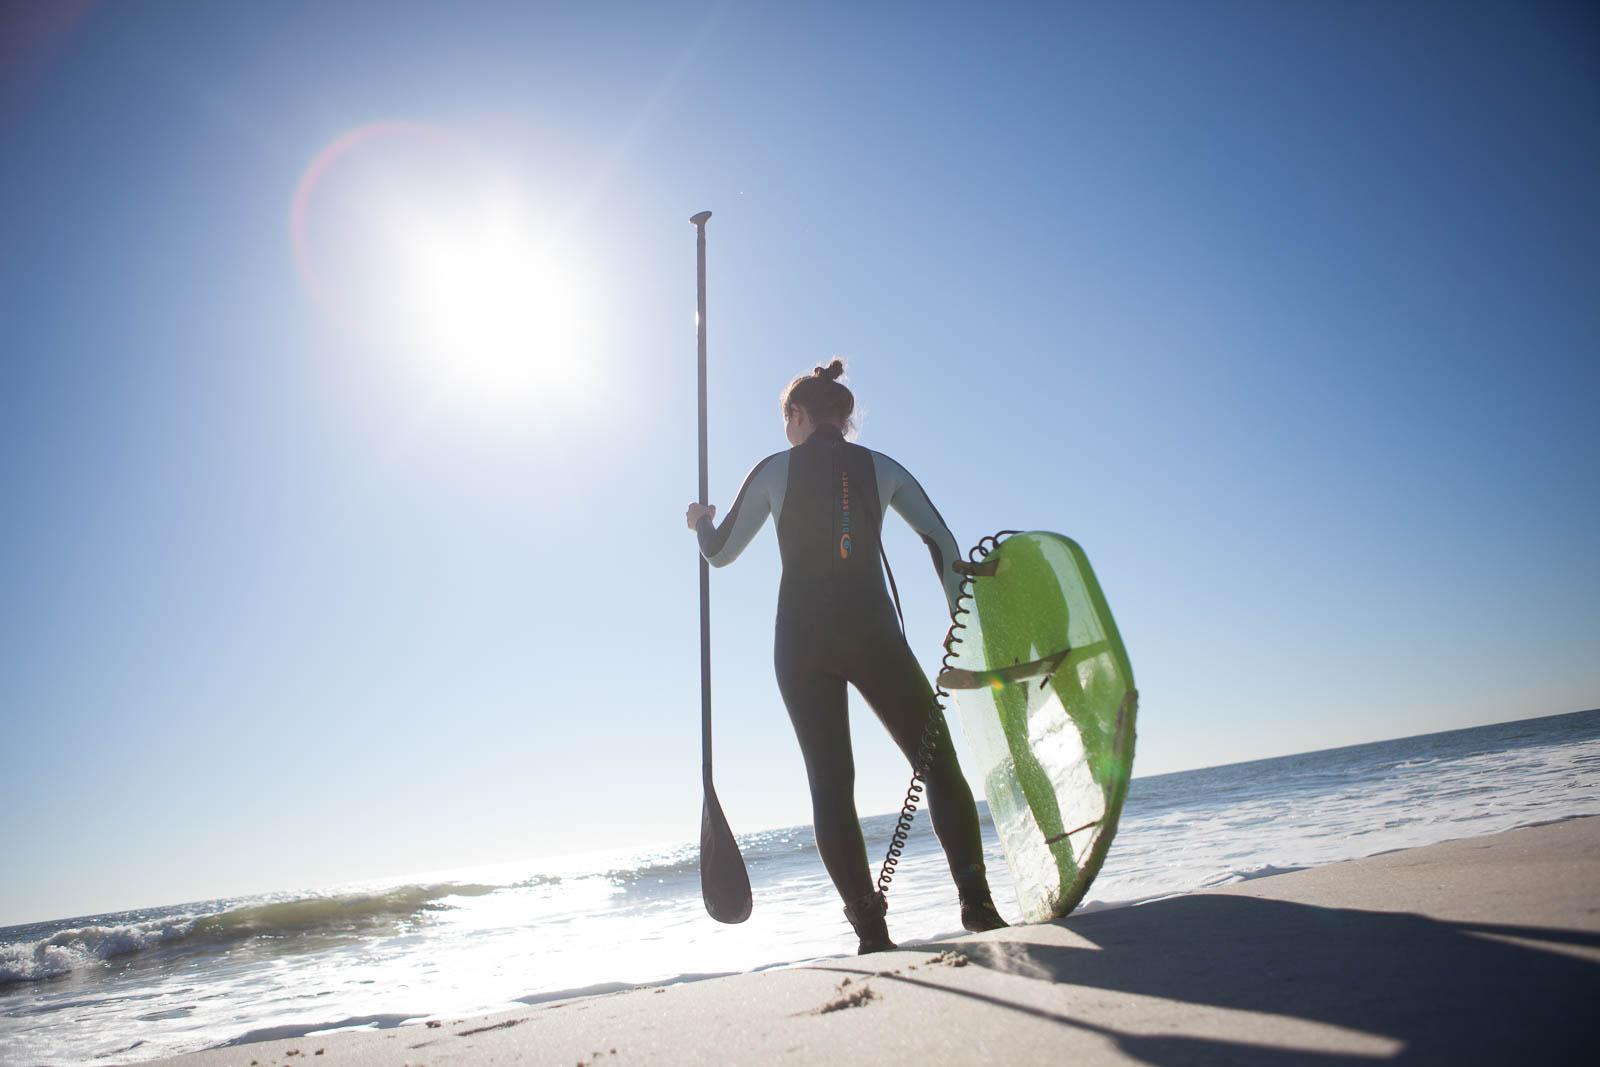 surfing-in-november-3